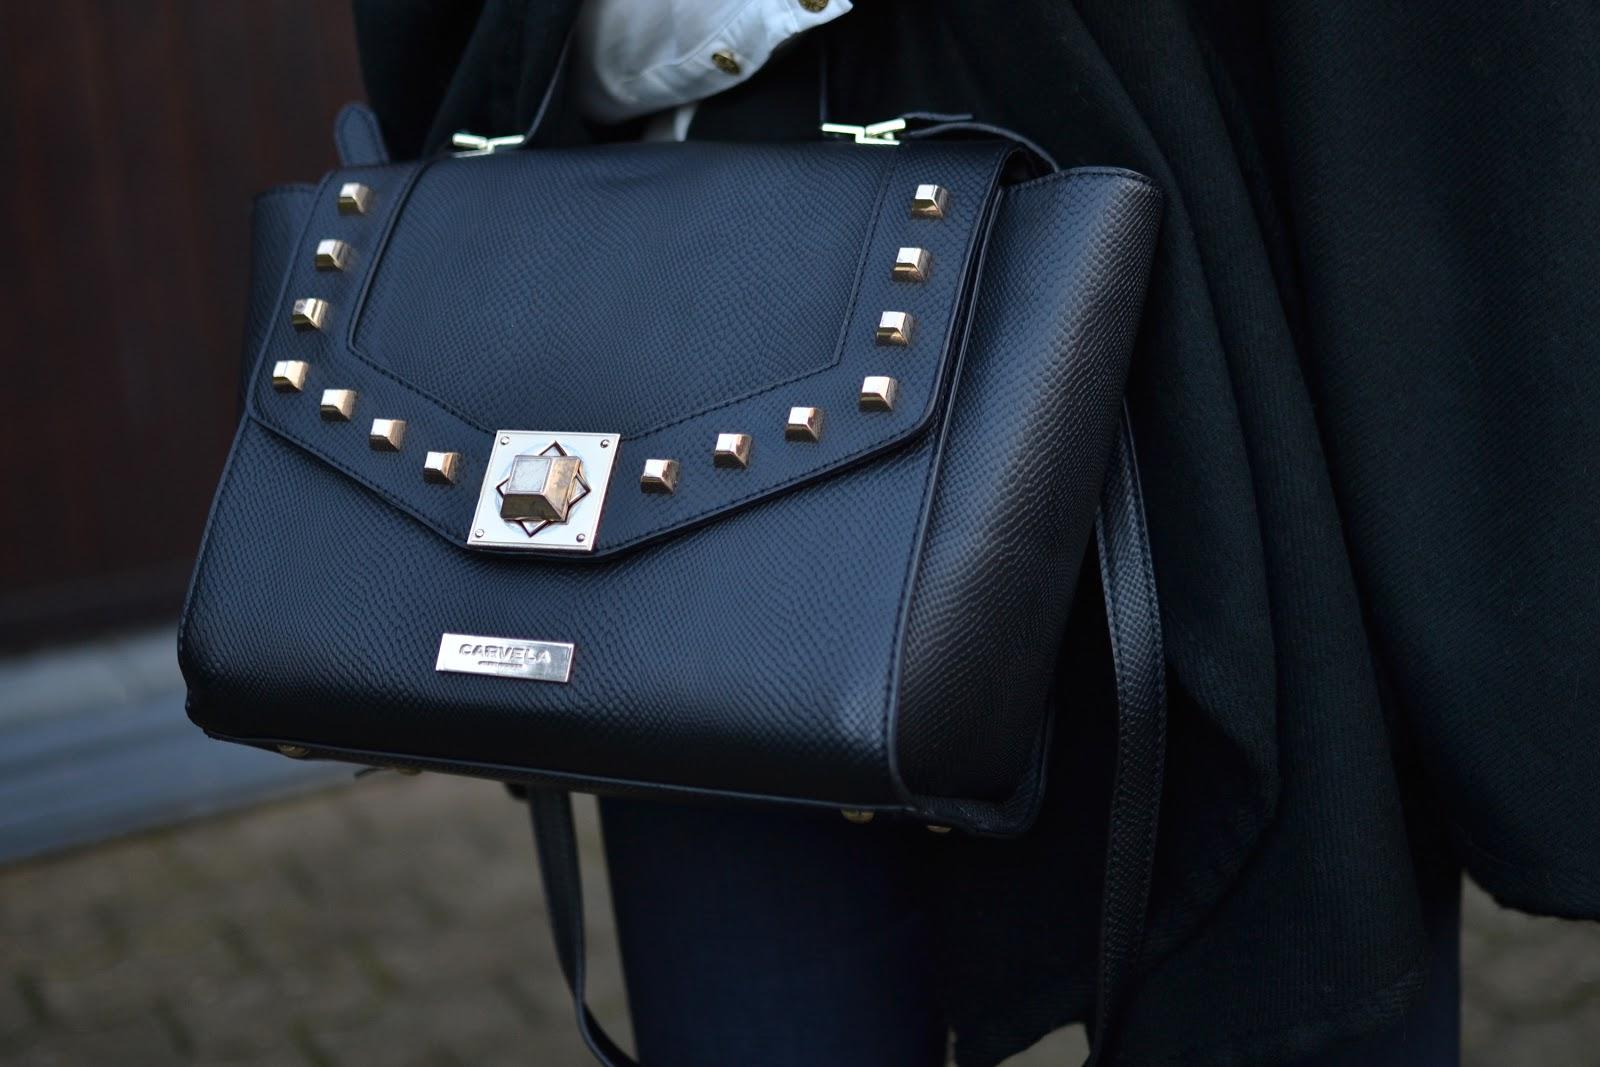 Kurt Geiger Carvela Angelika black studded bag